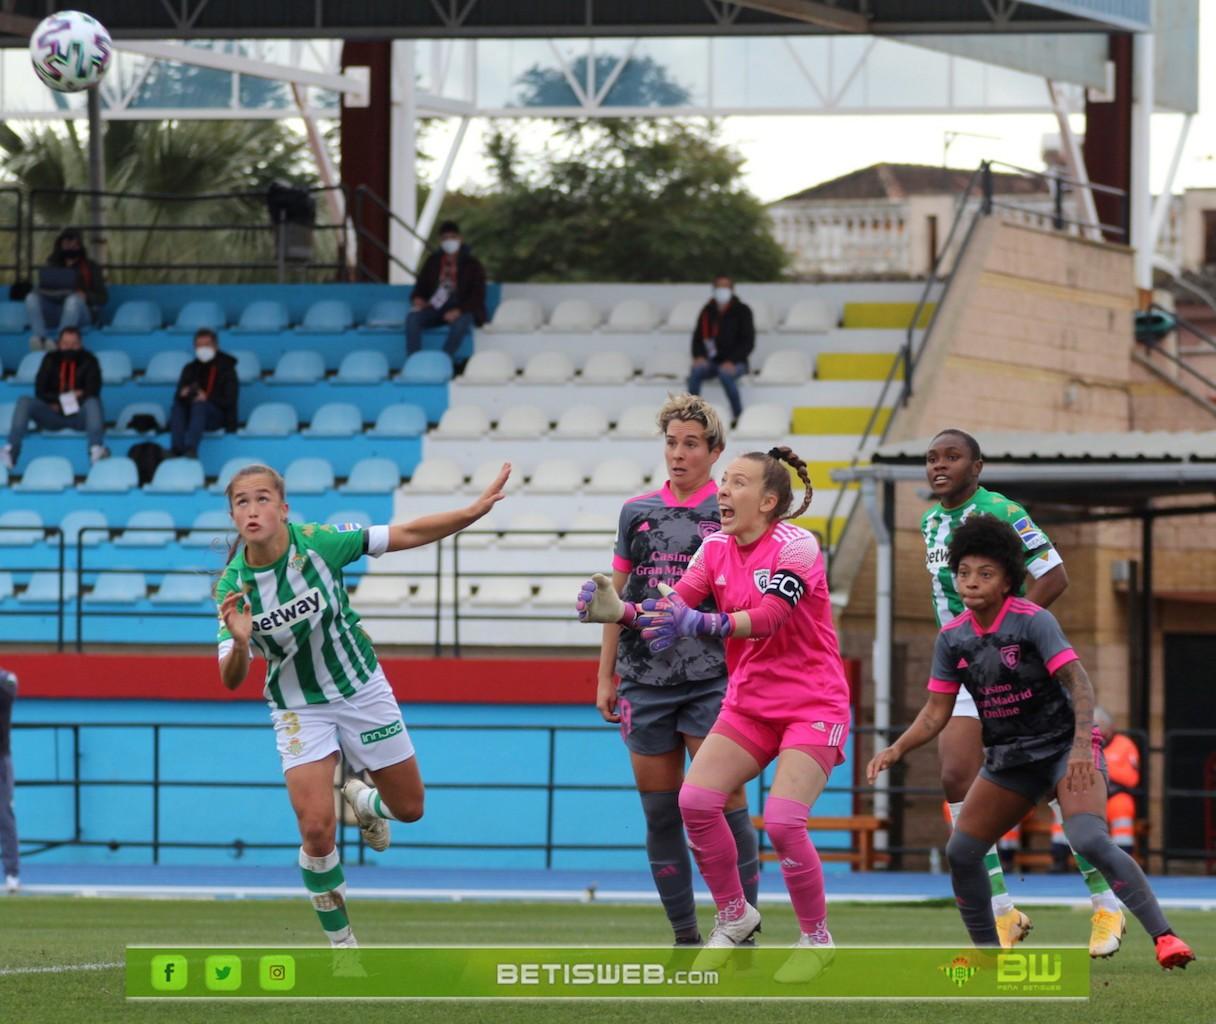 aJ16-–-Real-Betis-Fem-vs-Madrid-CFF259